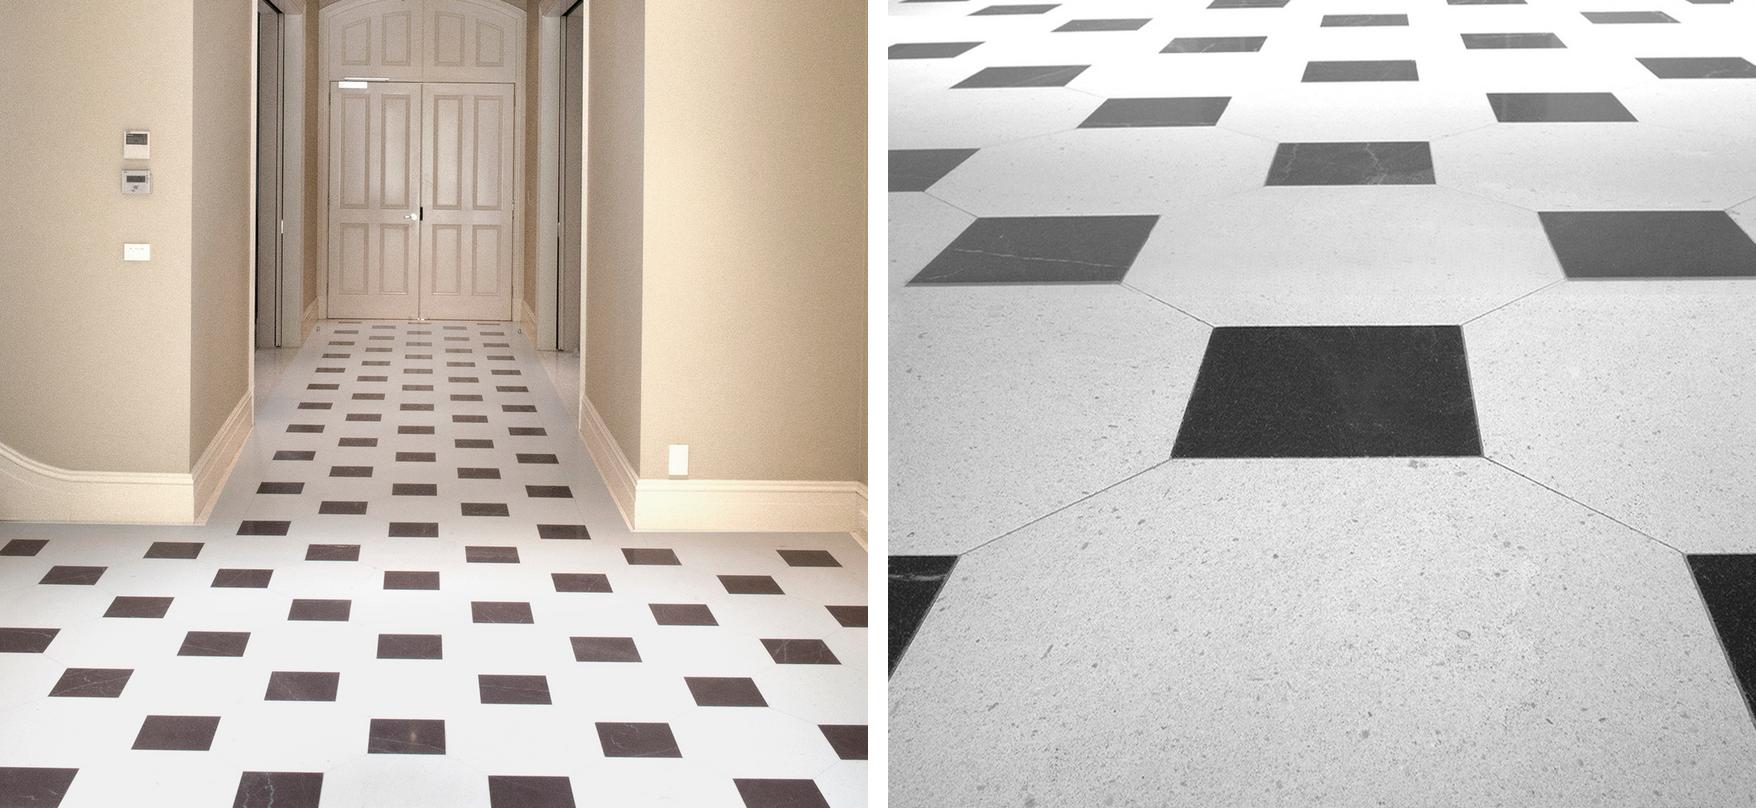 Left: exampleof cleaned limestone floor, Right: example of cleaned limestone tiles